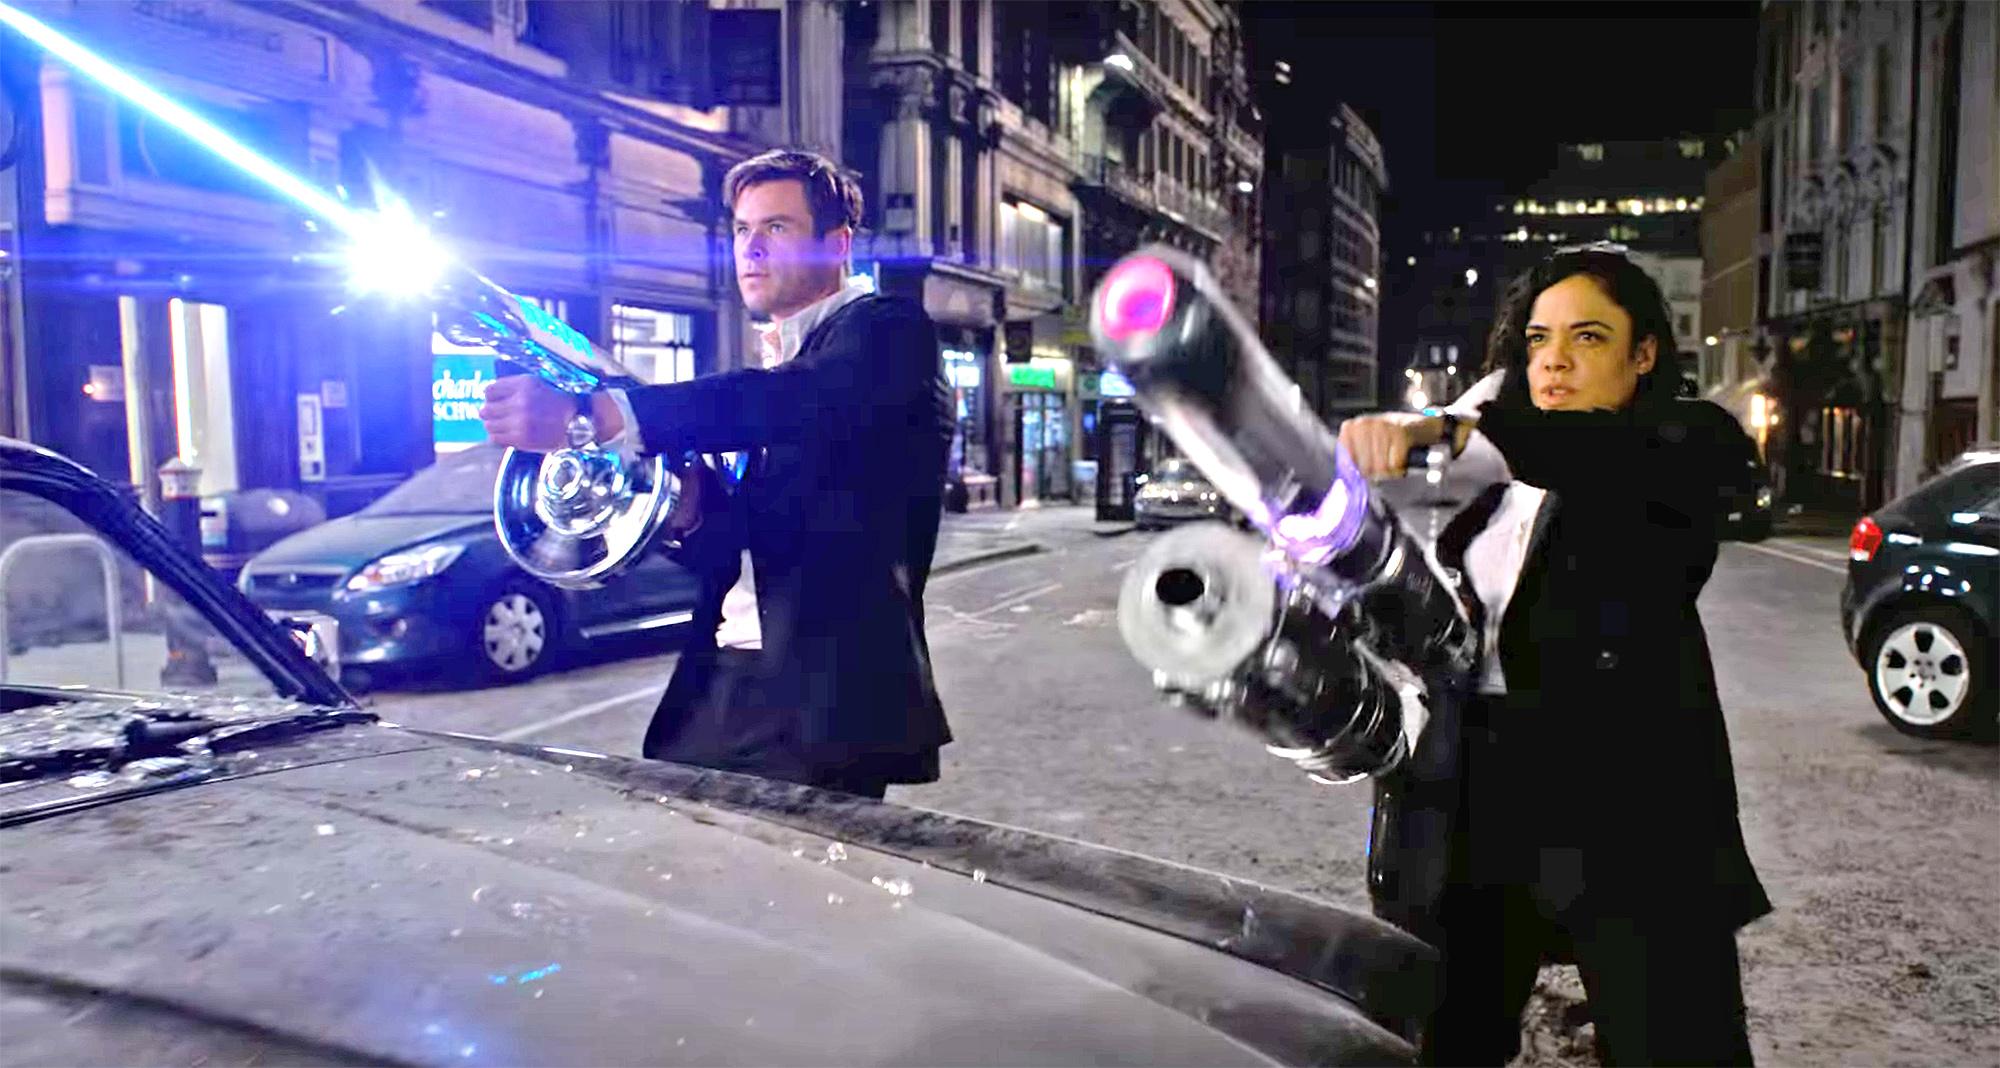 Chris Hemsworth and Tessa Thompson Fight Aliens in First Trailer for Men in Black: International